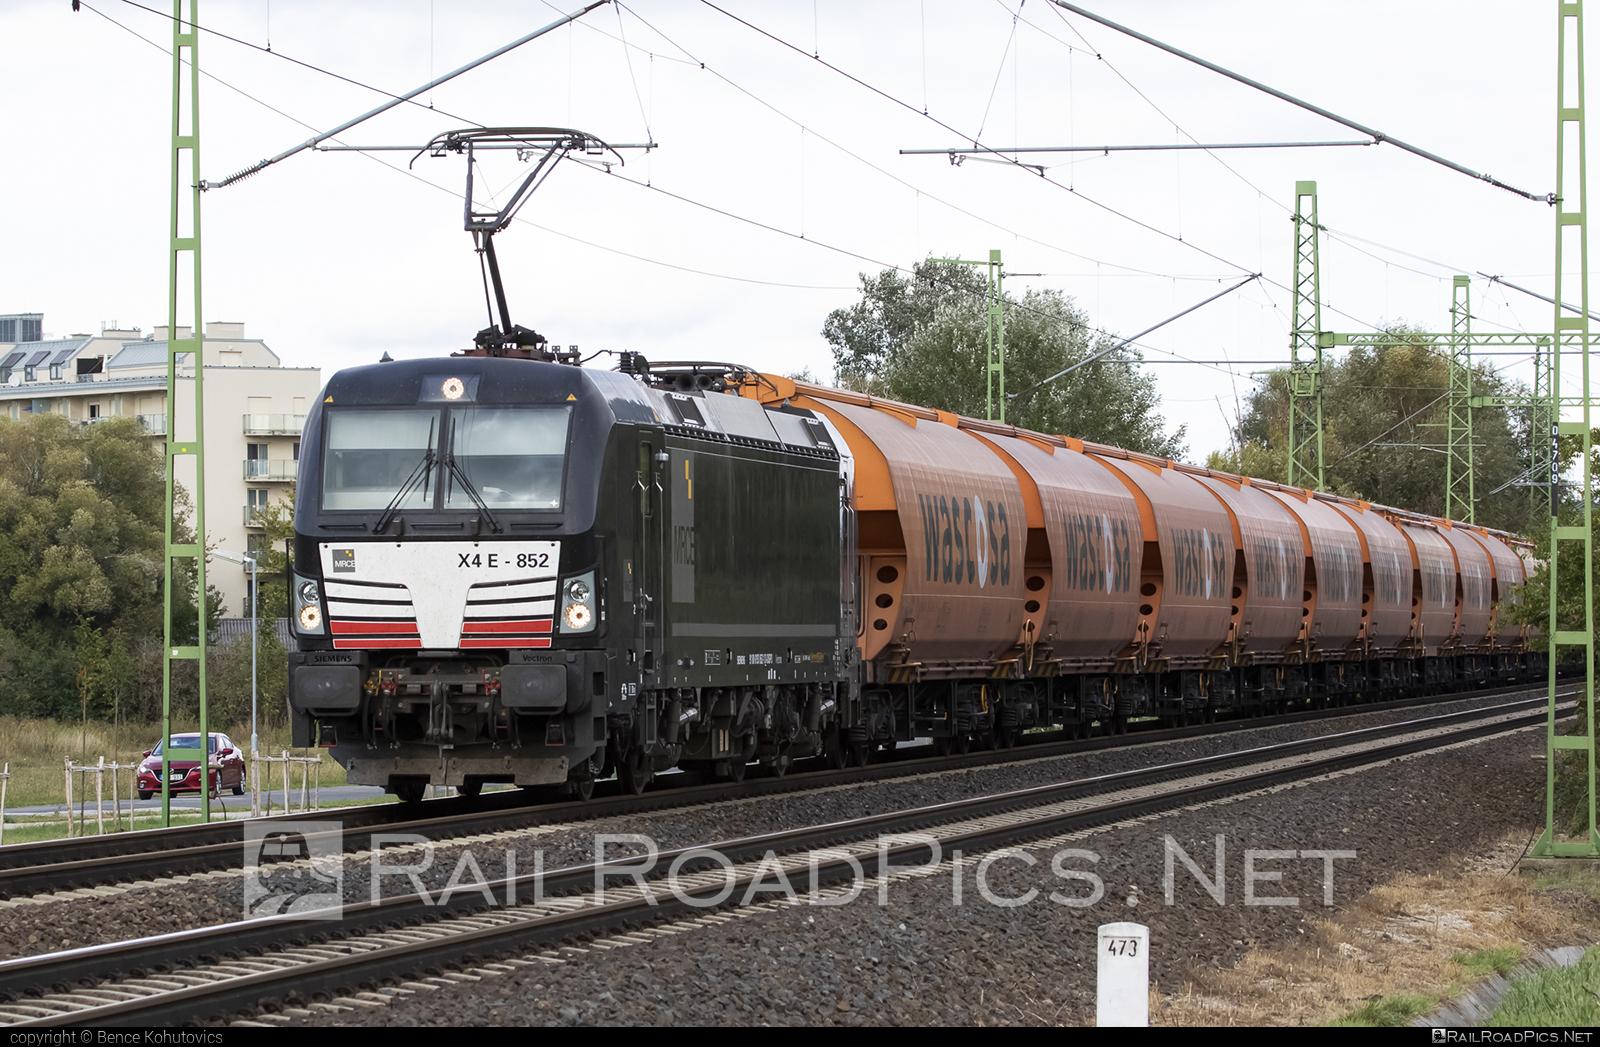 Siemens Vectron MS - 193 852-1 operated by Eisenbahnen und Verkehrsbetriebe Elbe-Weser #dispolok #hopperwagon #mitsuirailcapitaleurope #mitsuirailcapitaleuropegmbh #mrce #siemens #siemensvectron #siemensvectronms #vectron #vectronms #wascosa